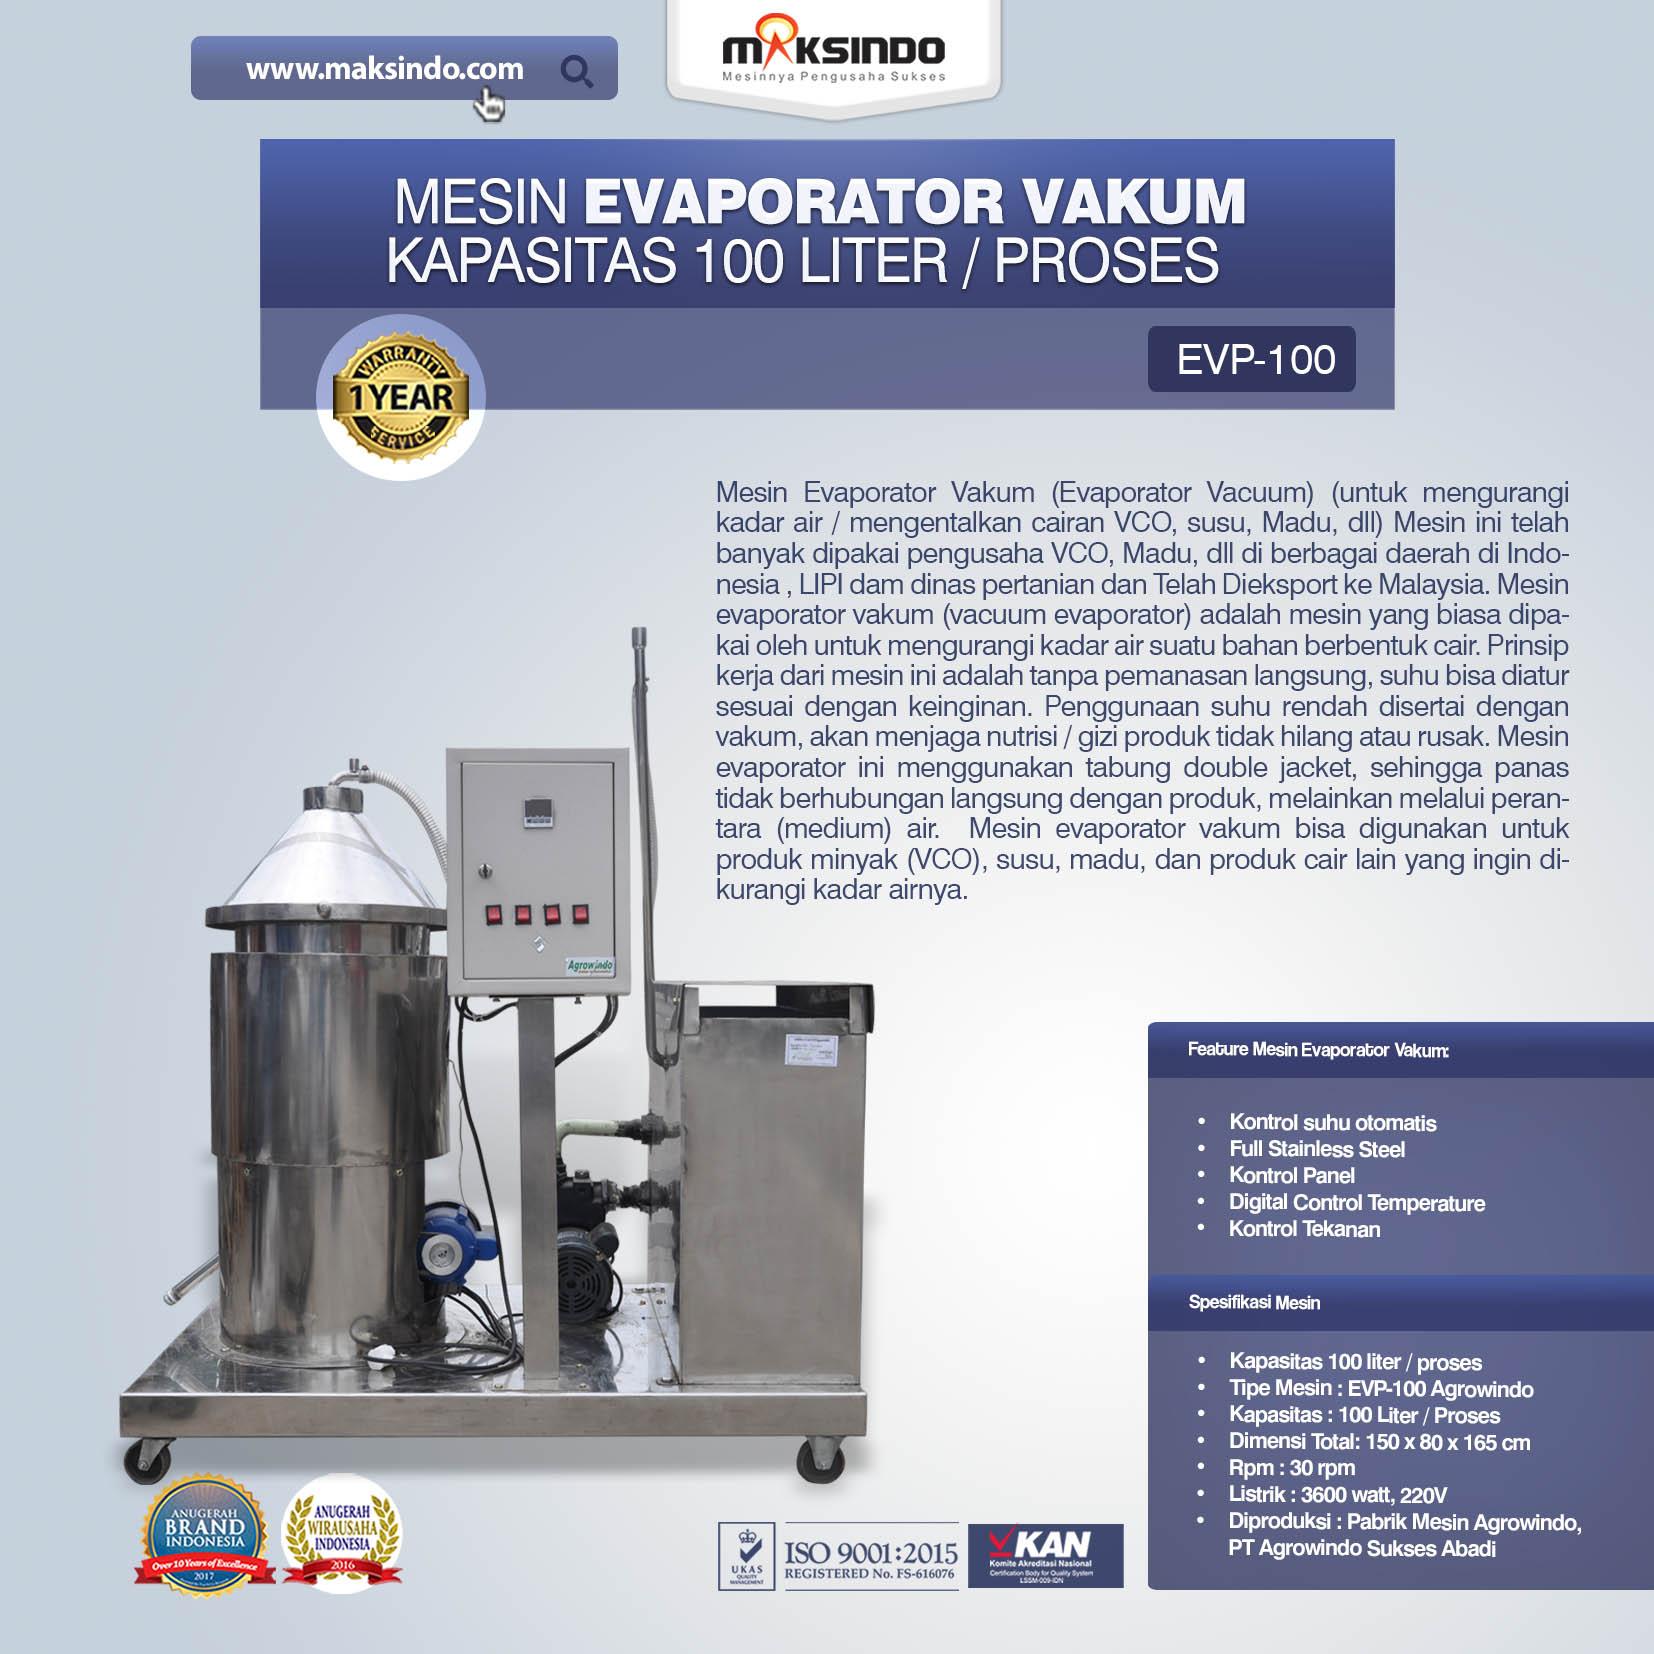 Mesin Evaporator Vakum Kapasitas 100 Liter Proses